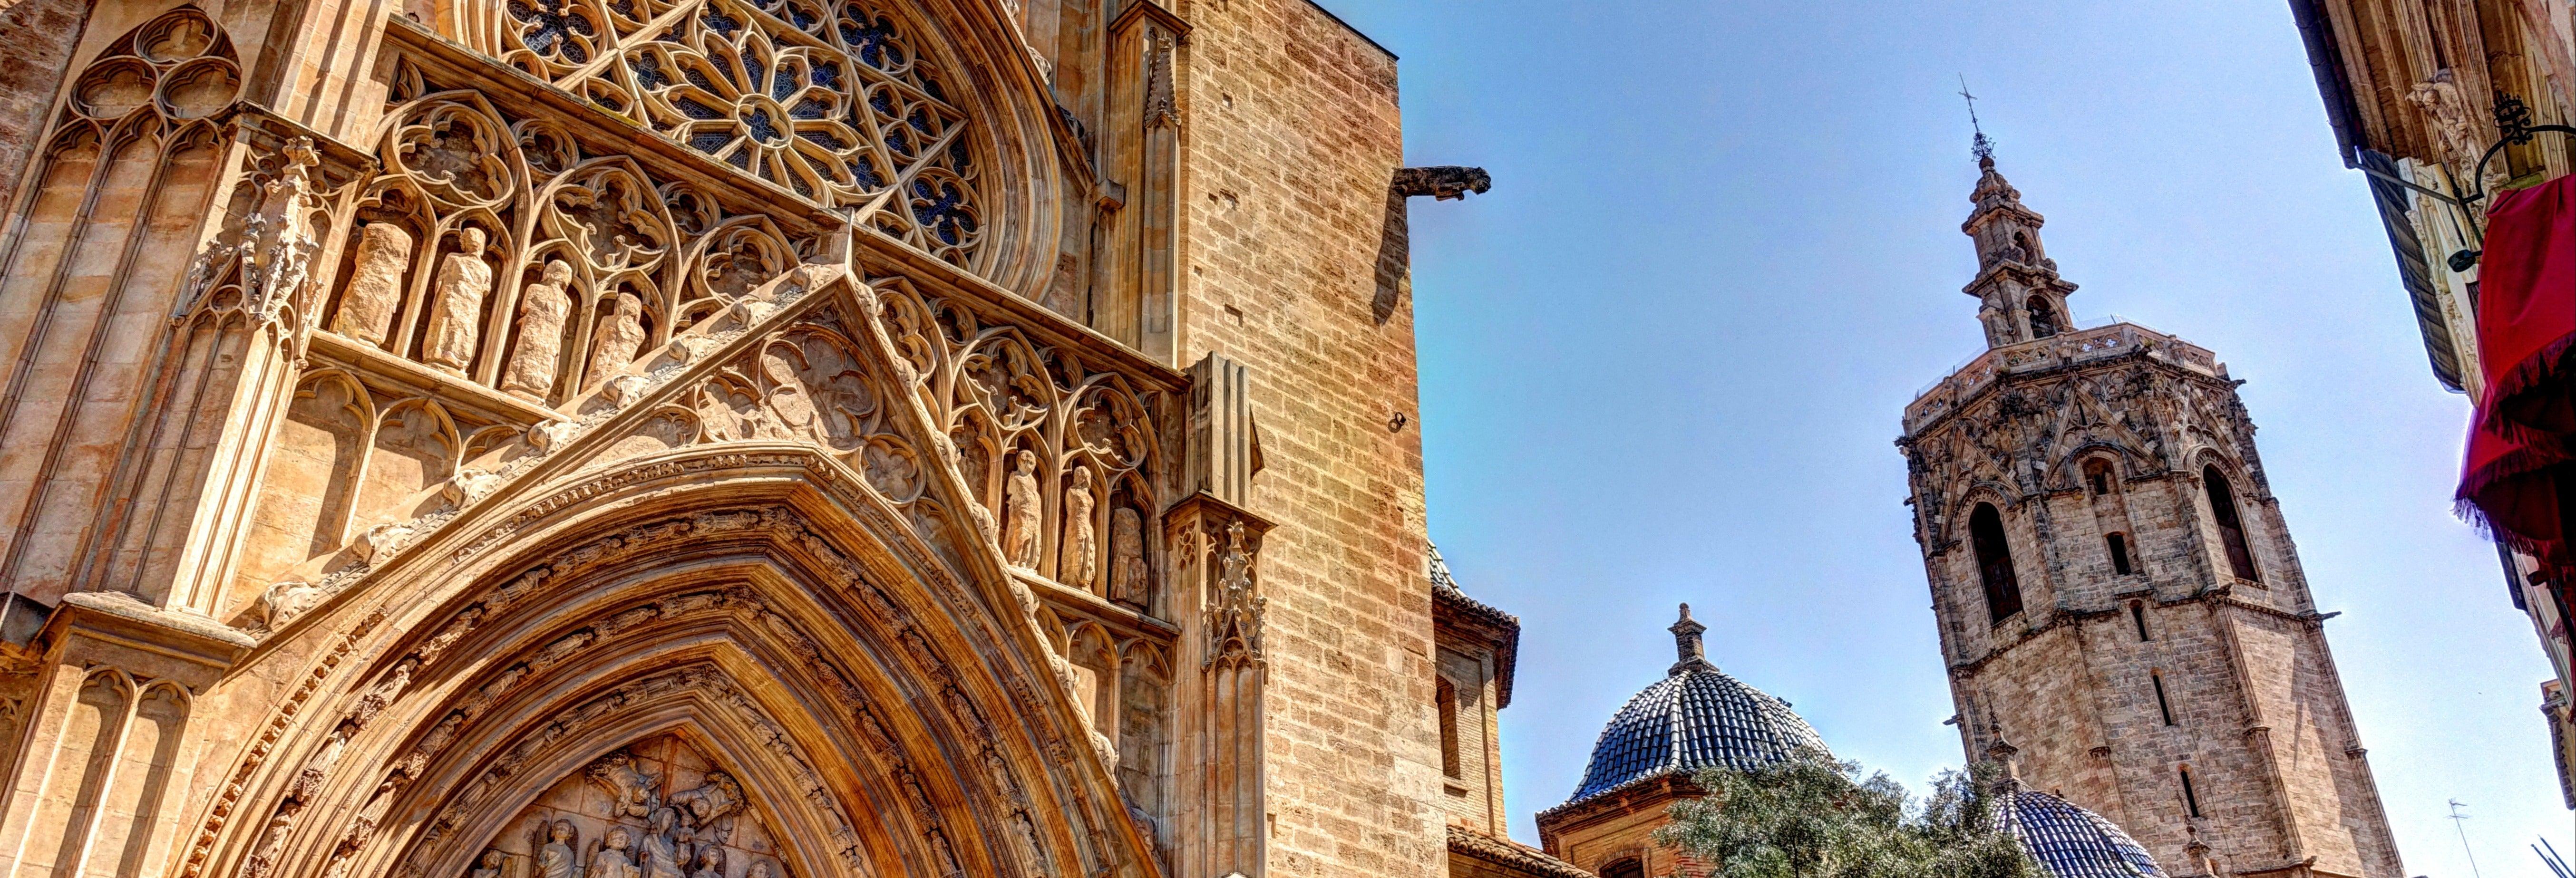 Visite de la Valence médiévale